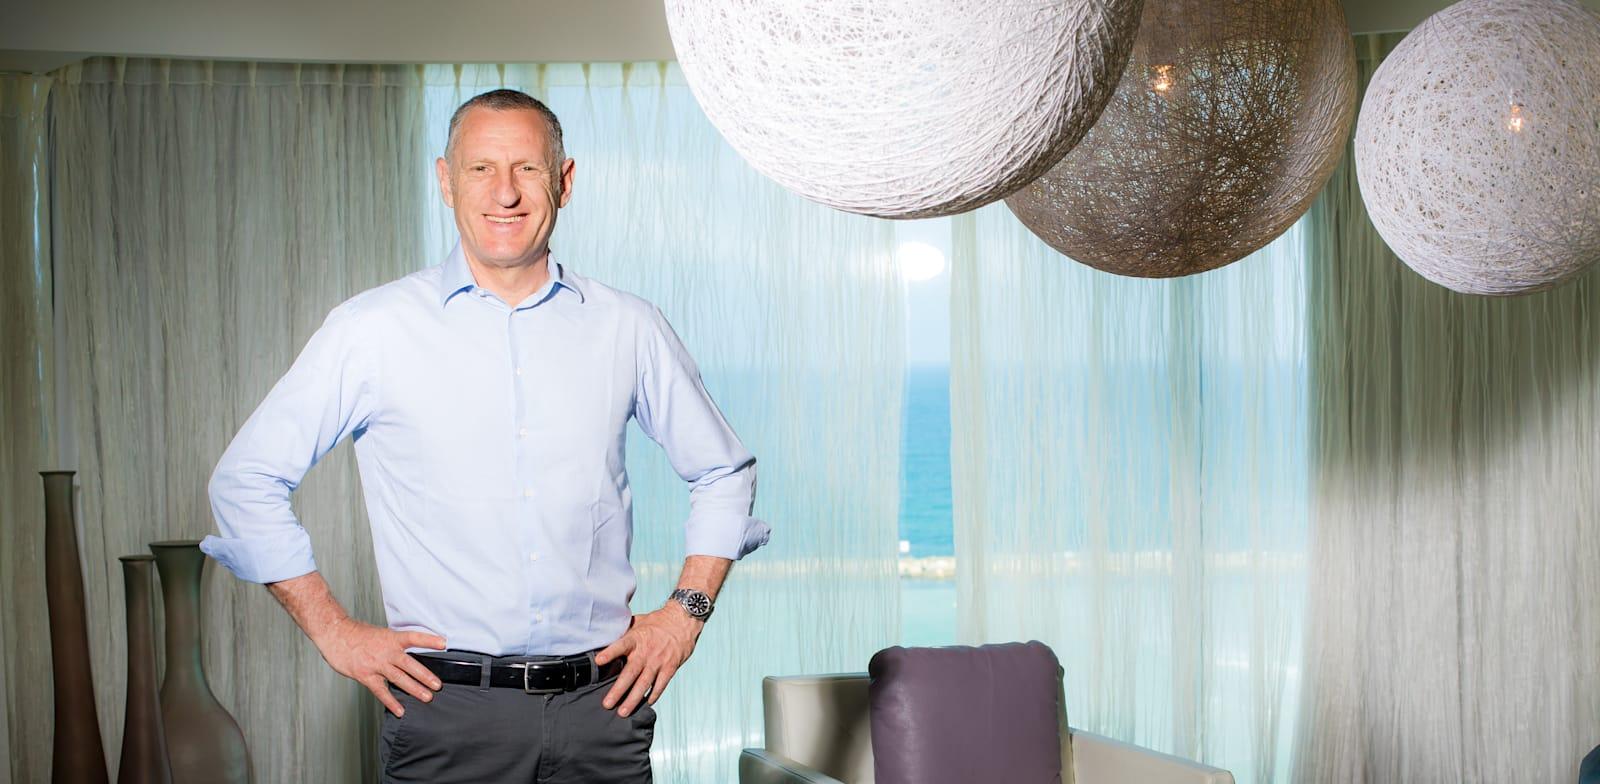 Isrotel CEO Lior Raviv Photo: Arik Sultan